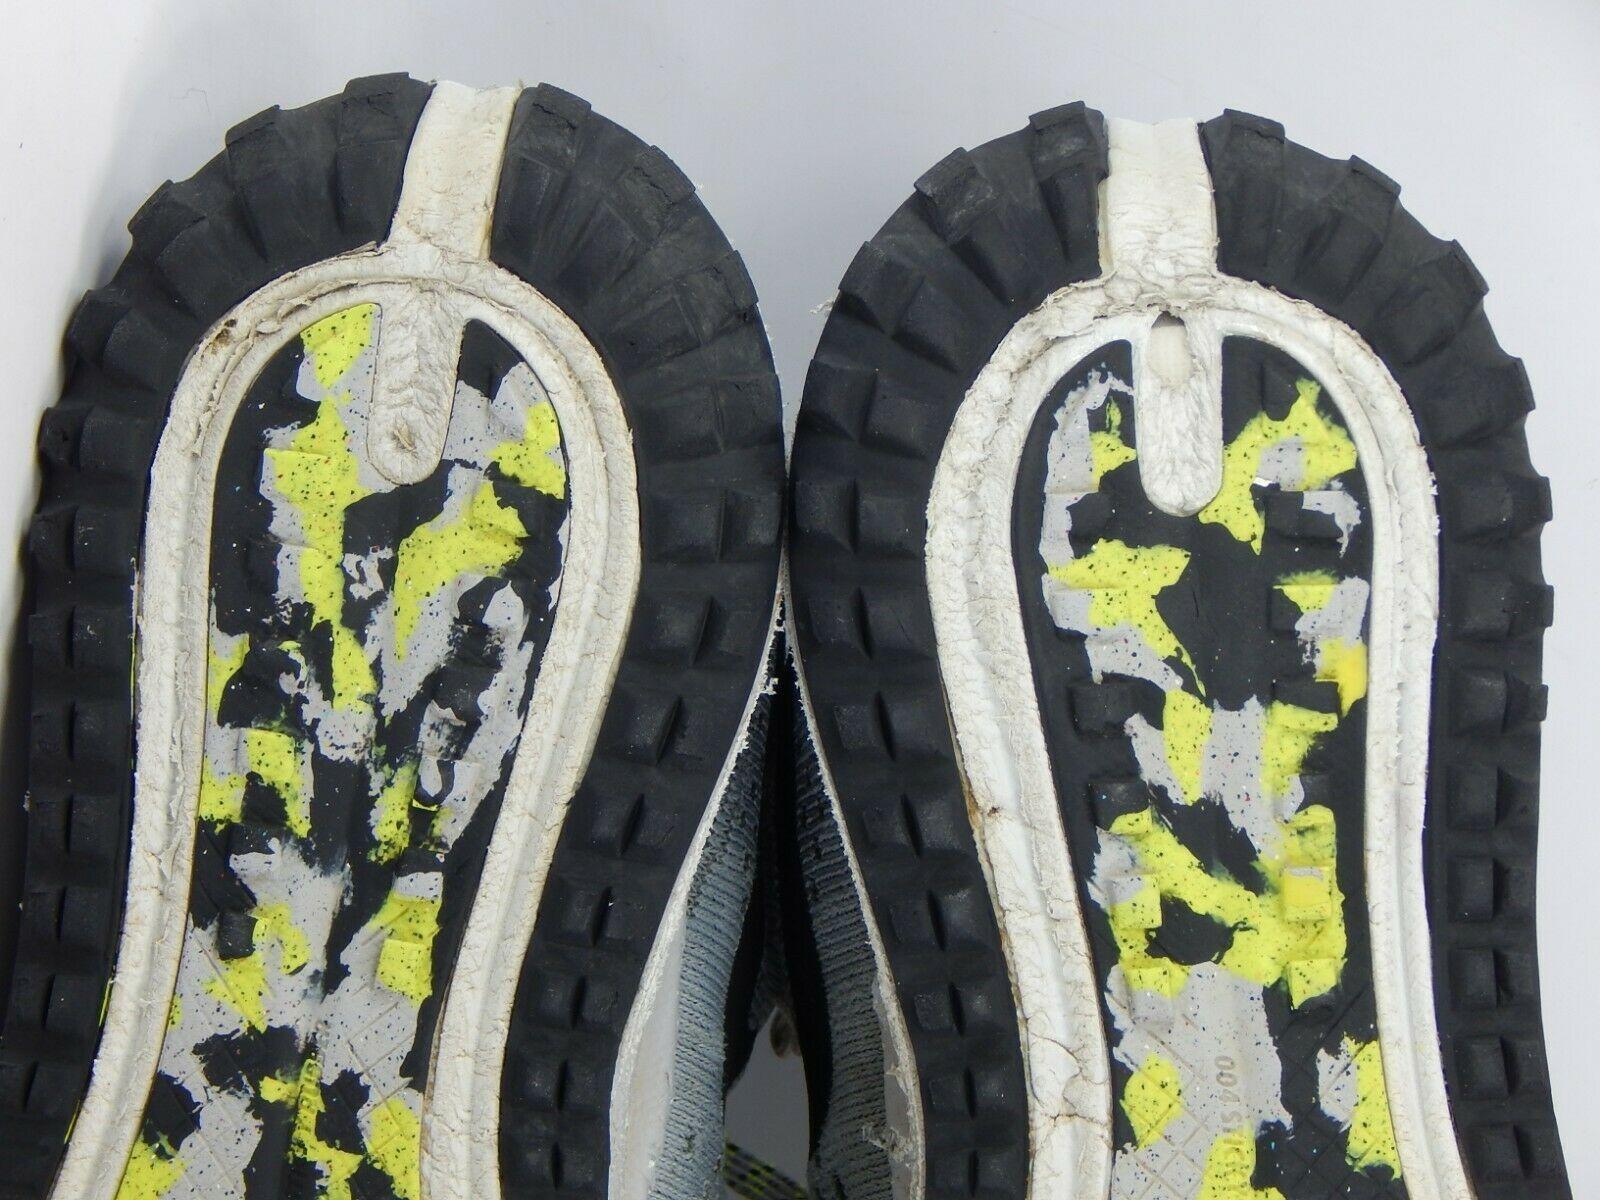 Nike Zoom Terra Kiger 4 Sz 9.5 M (D) EU 43 Men's Trail Running Shoes 880563-002